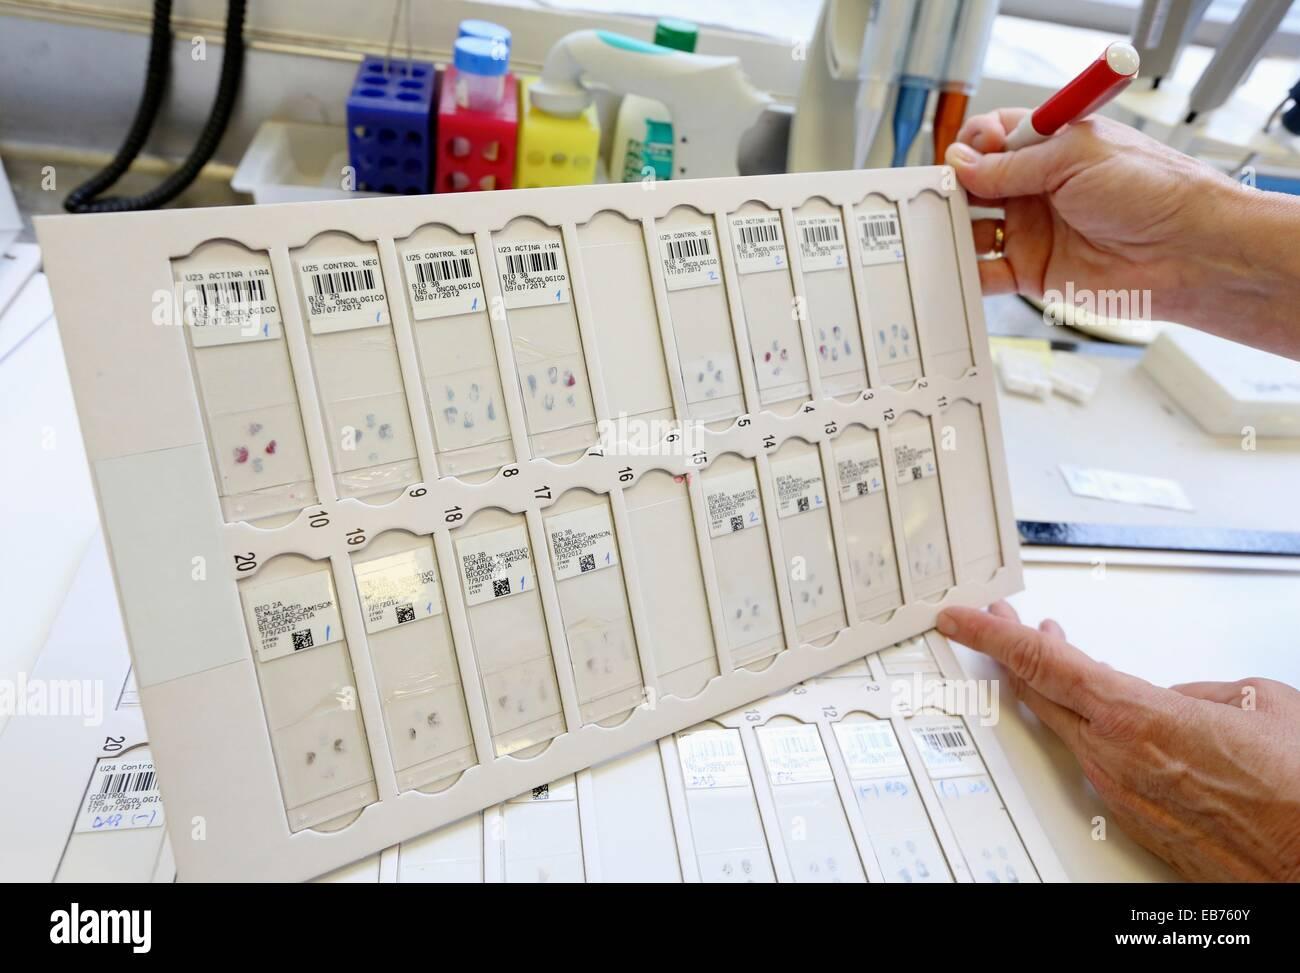 how to become an anatomical pathology technician